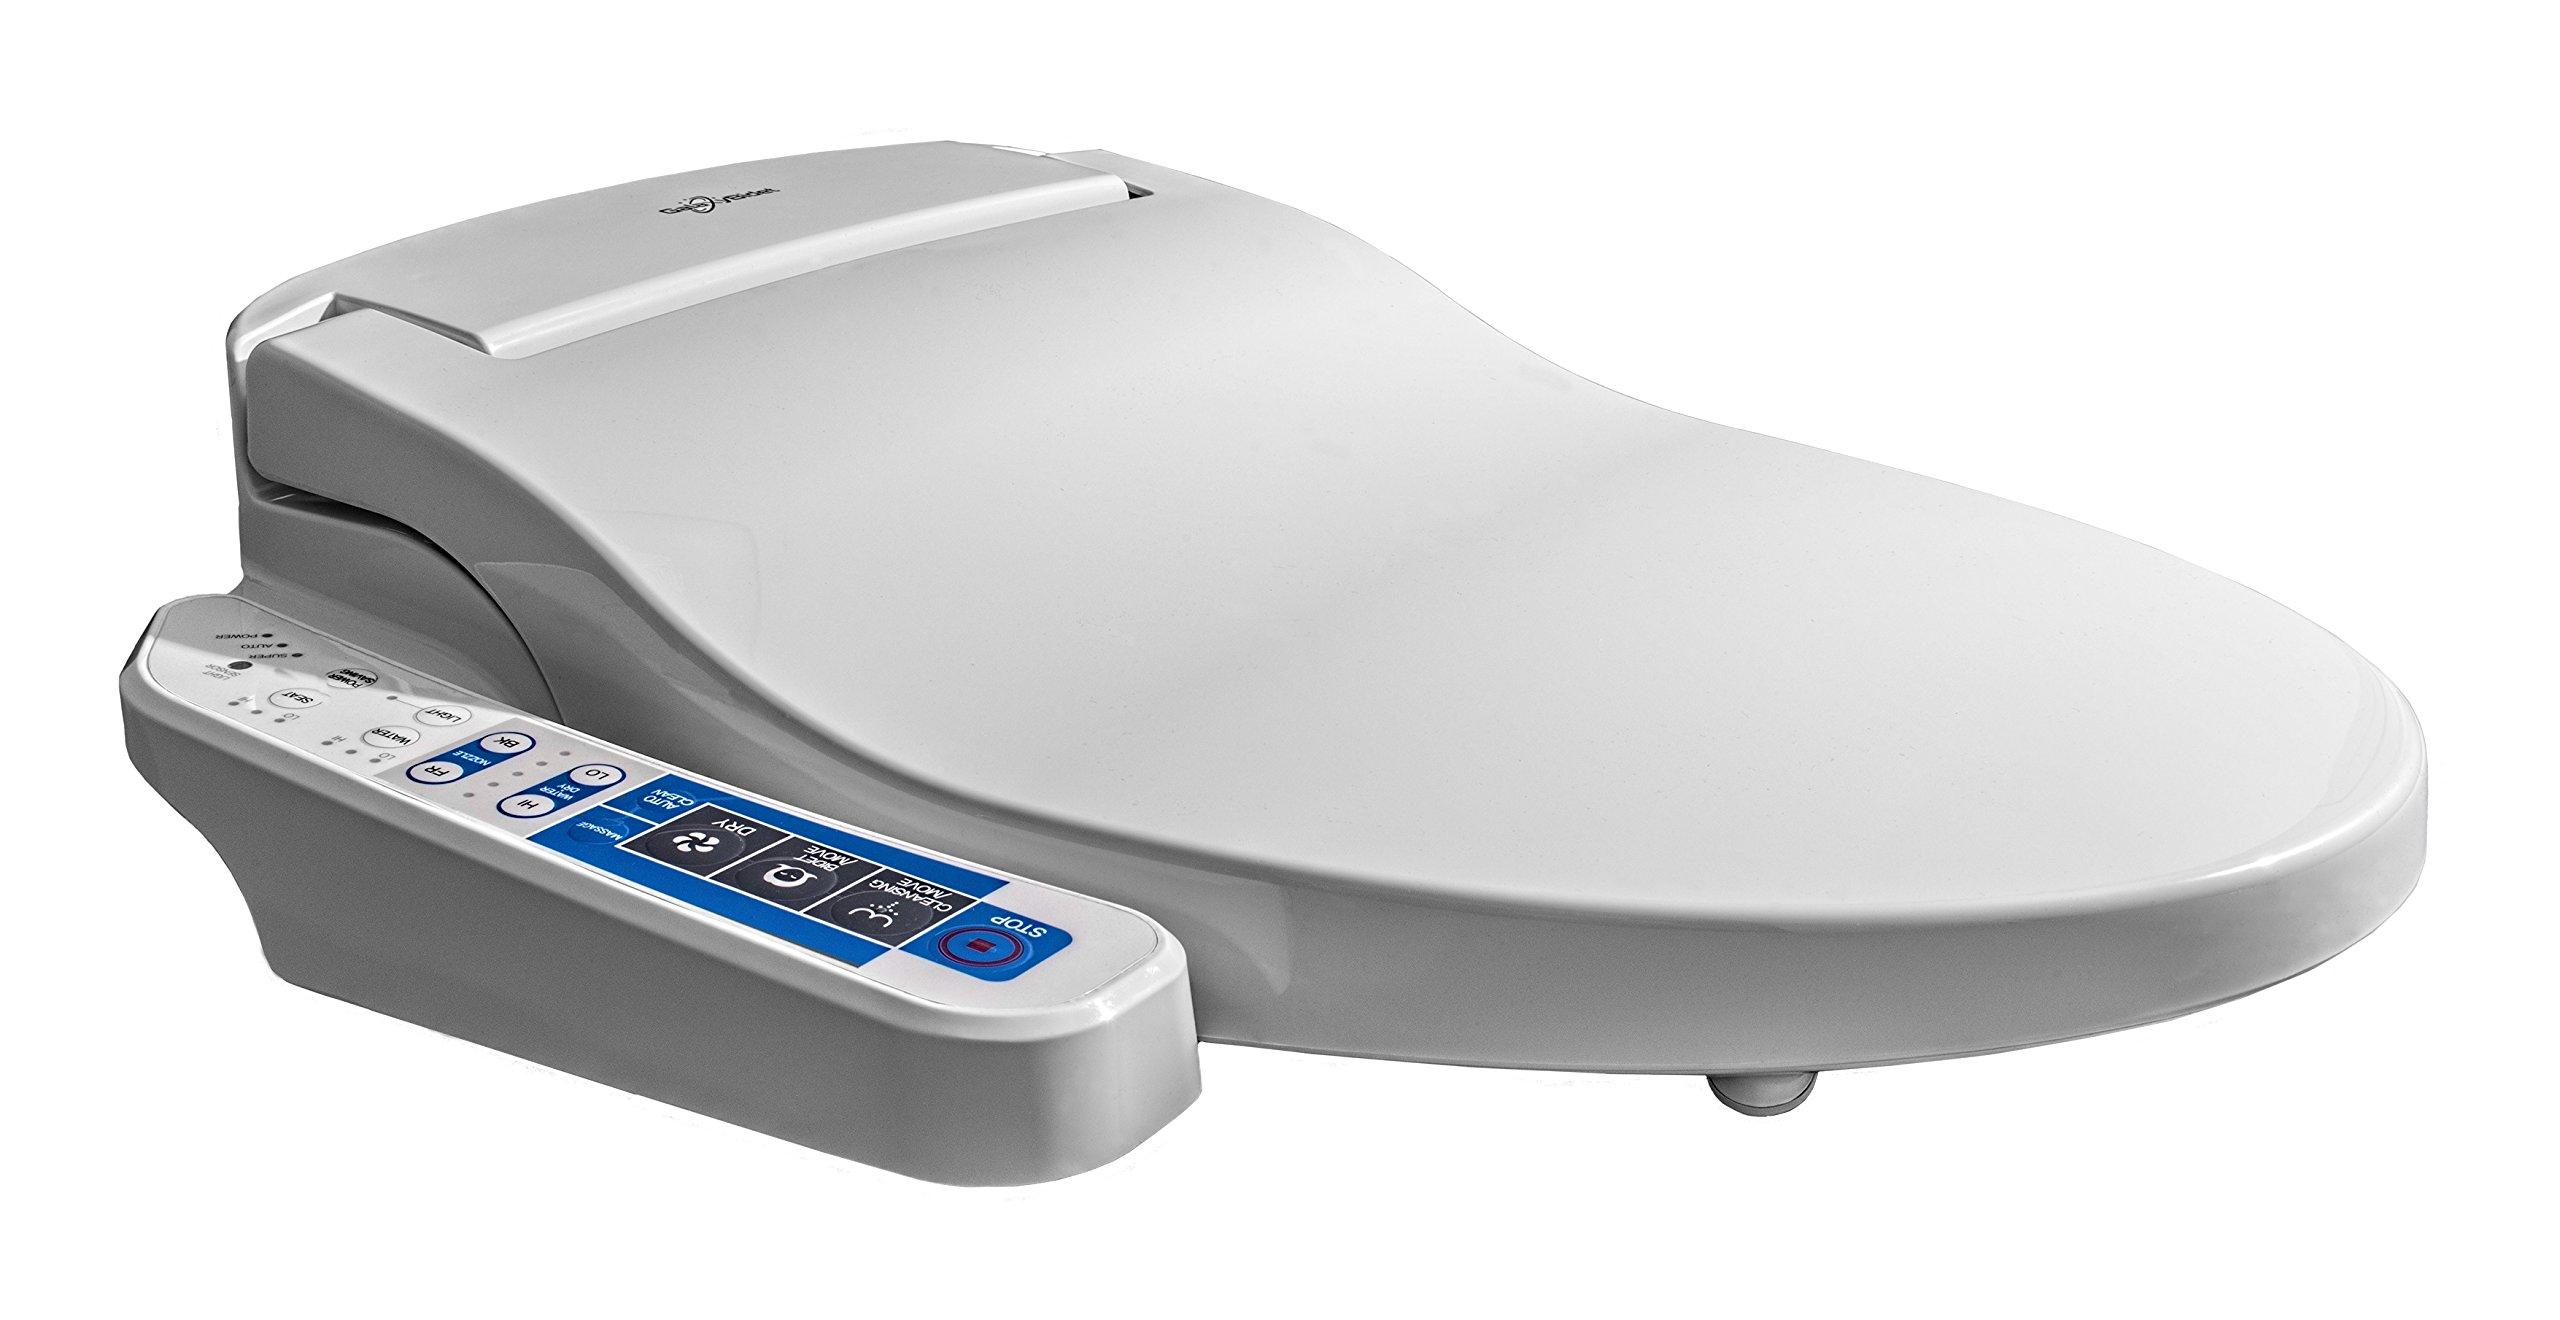 Galaxy Bidet Electronic W18.2 x D19.5 x H6.1 Inches Toilet Seat by Galaxy Bidet (Image #2)